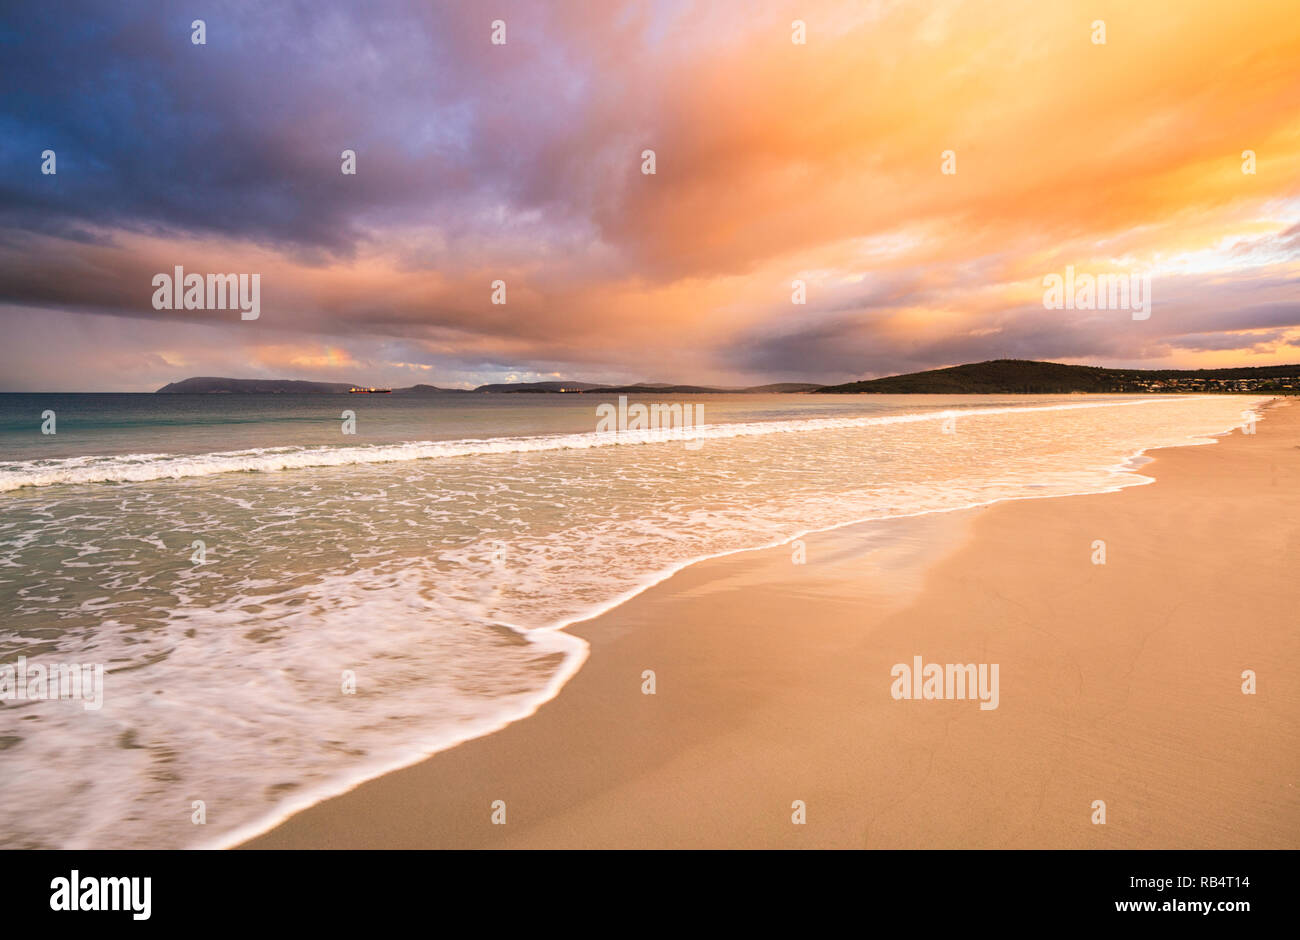 Albany, Western Australia. Middleton Beach at sunset - Stock Image